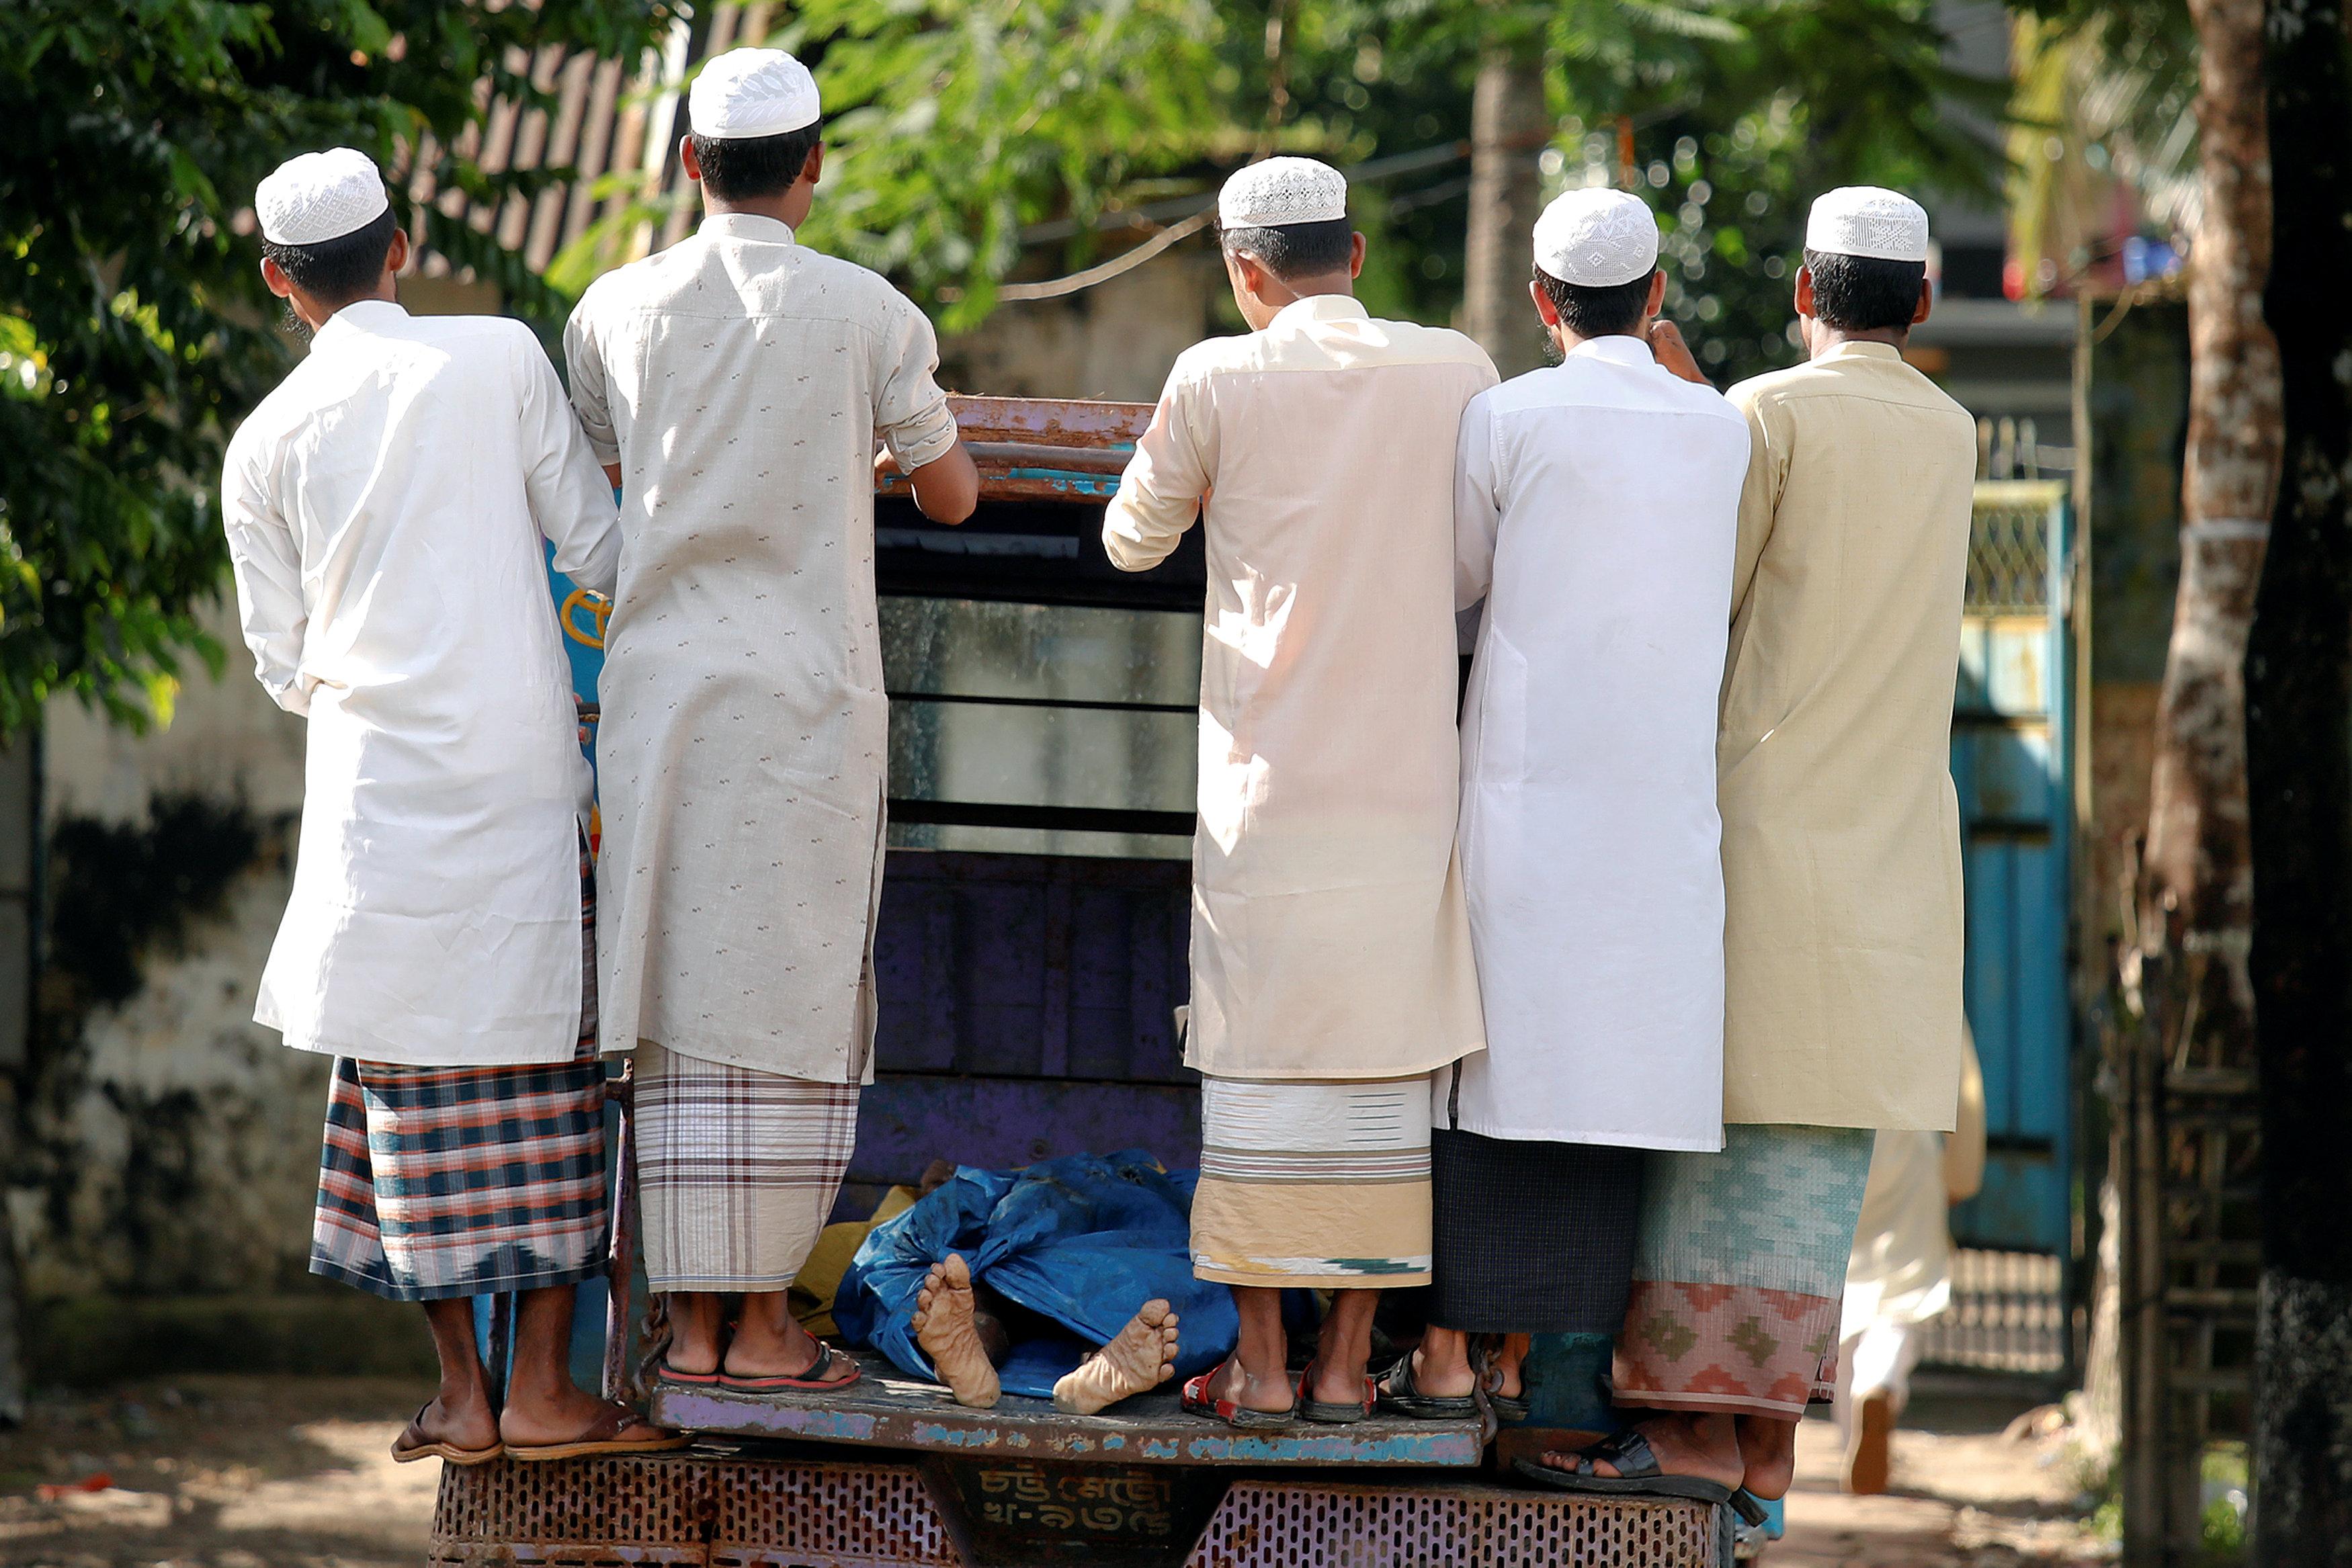 2017-10-09T041032Z_1350816034_RC15926B3F90_RTRMADP_3_MYANMAR-ROHINGYA